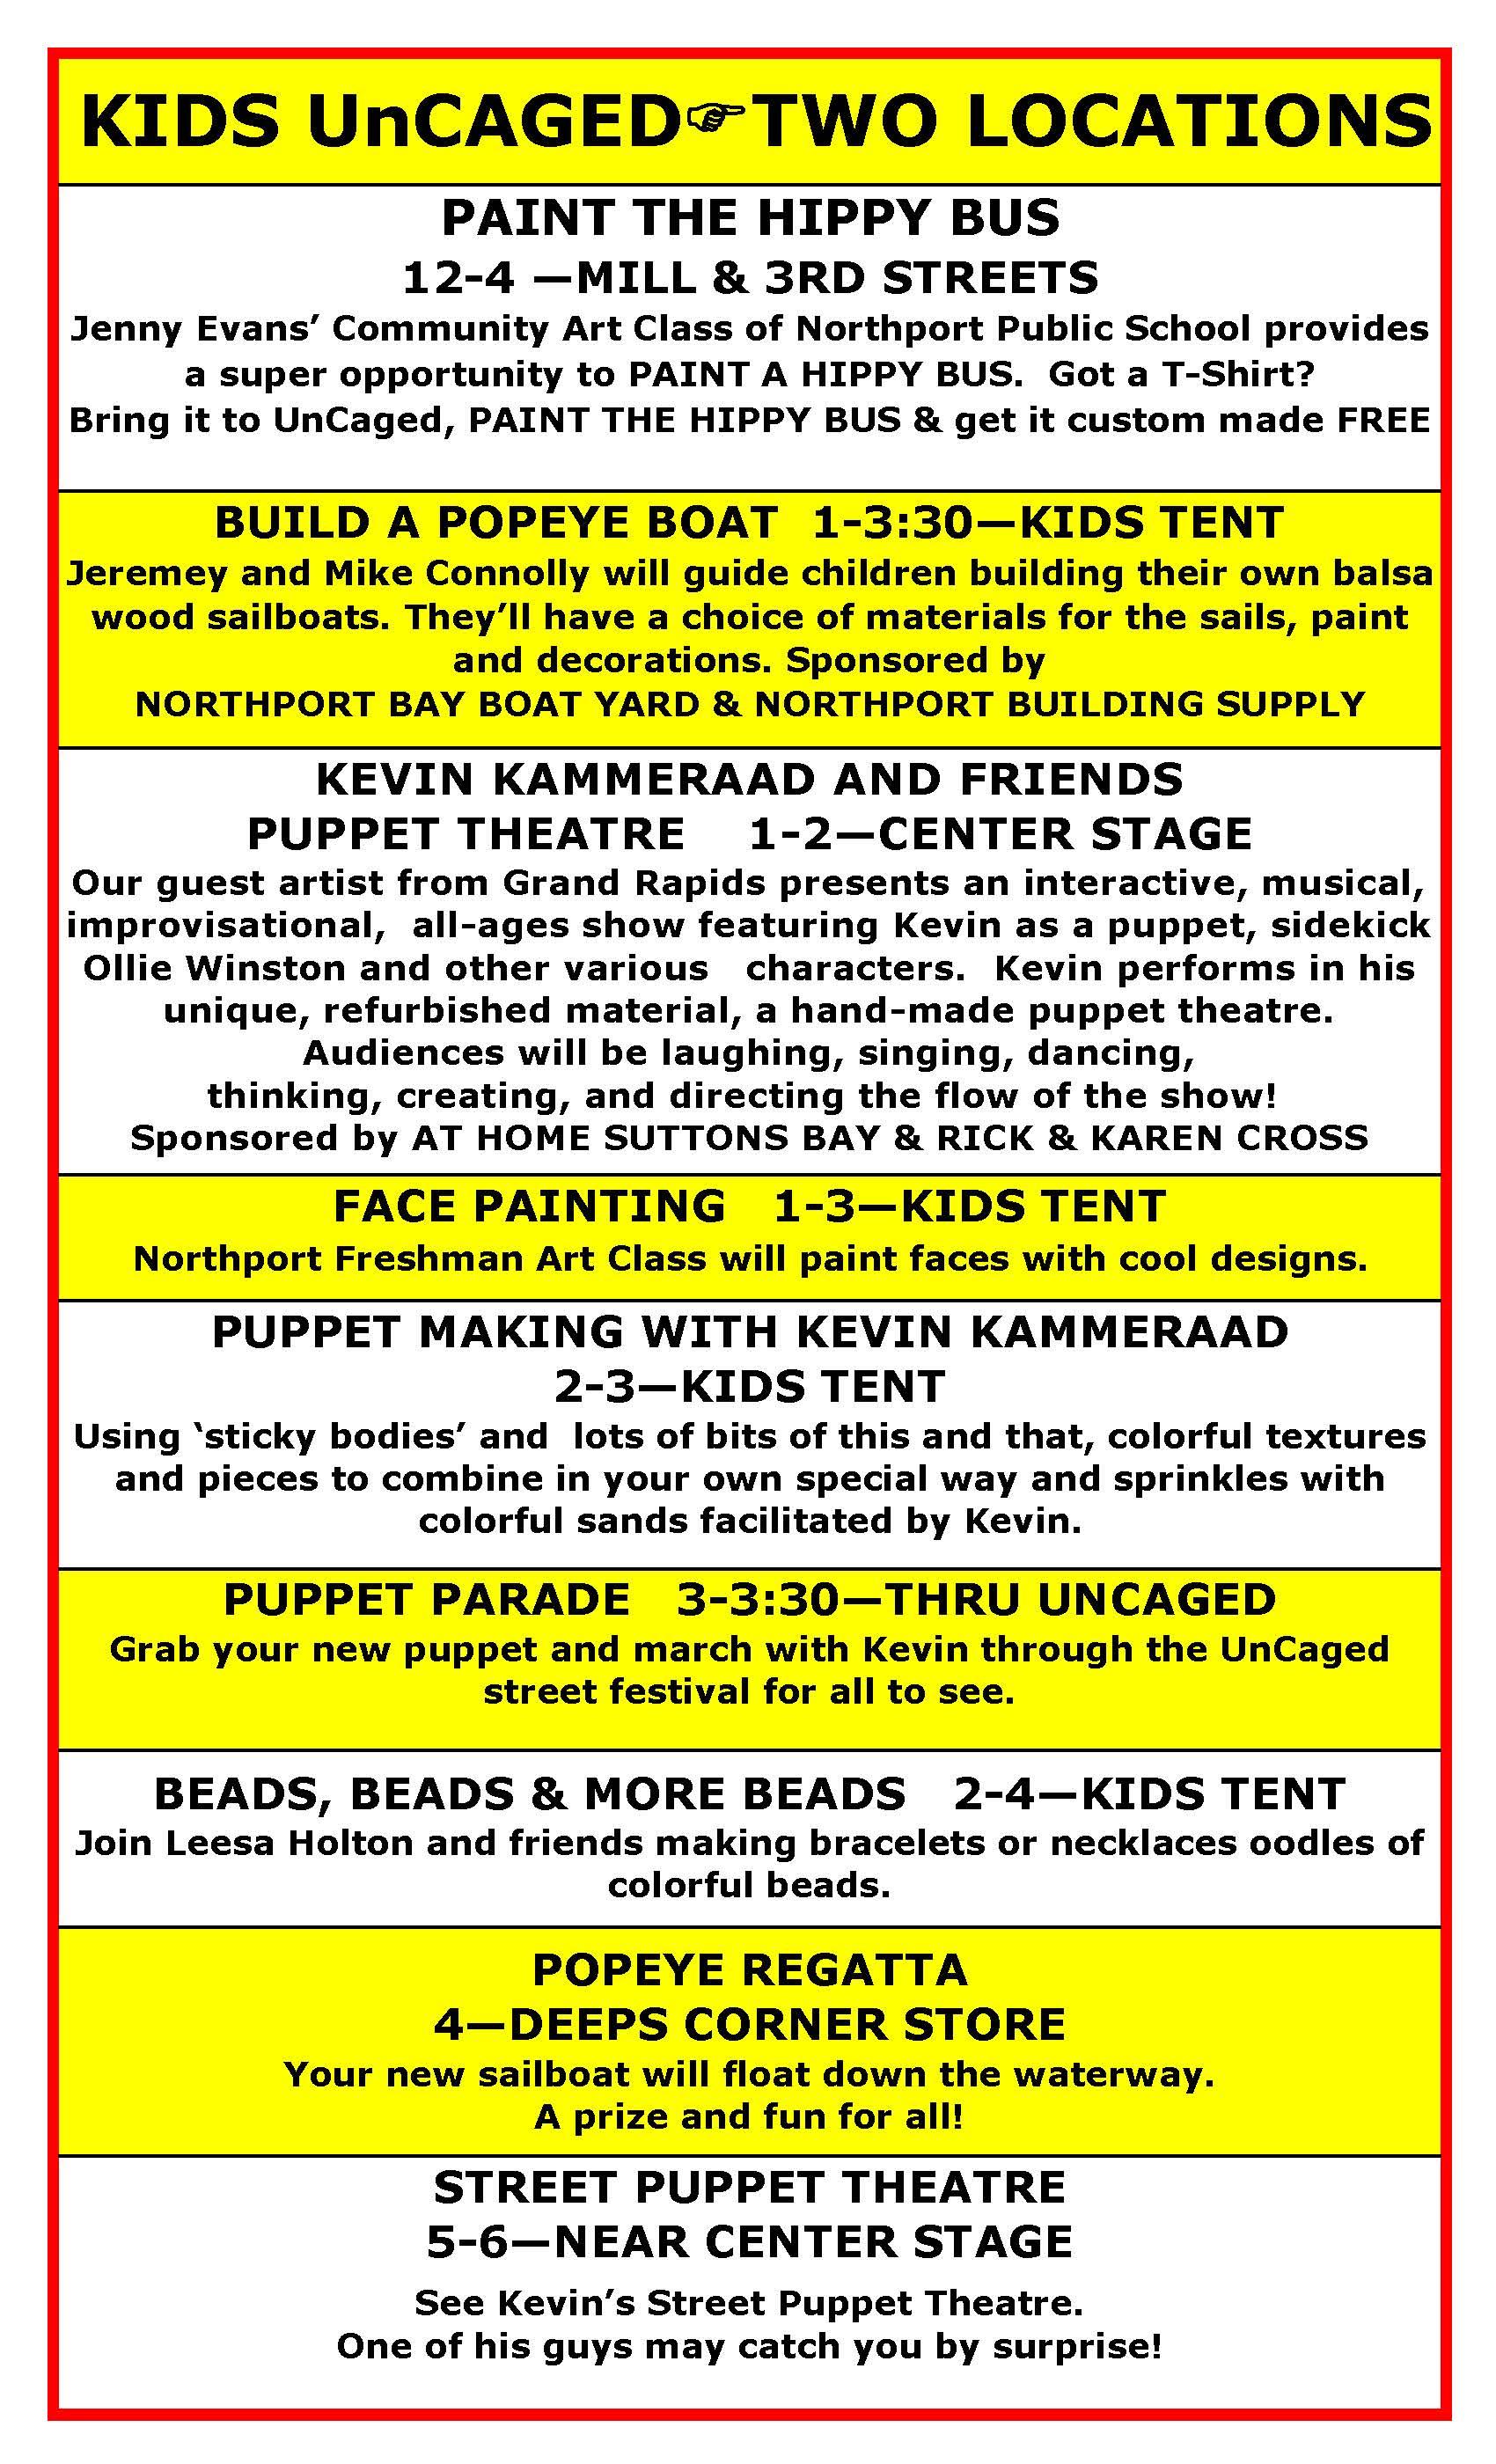 Kids UnCaged Schedule Enlarged 9.17.17.jpg